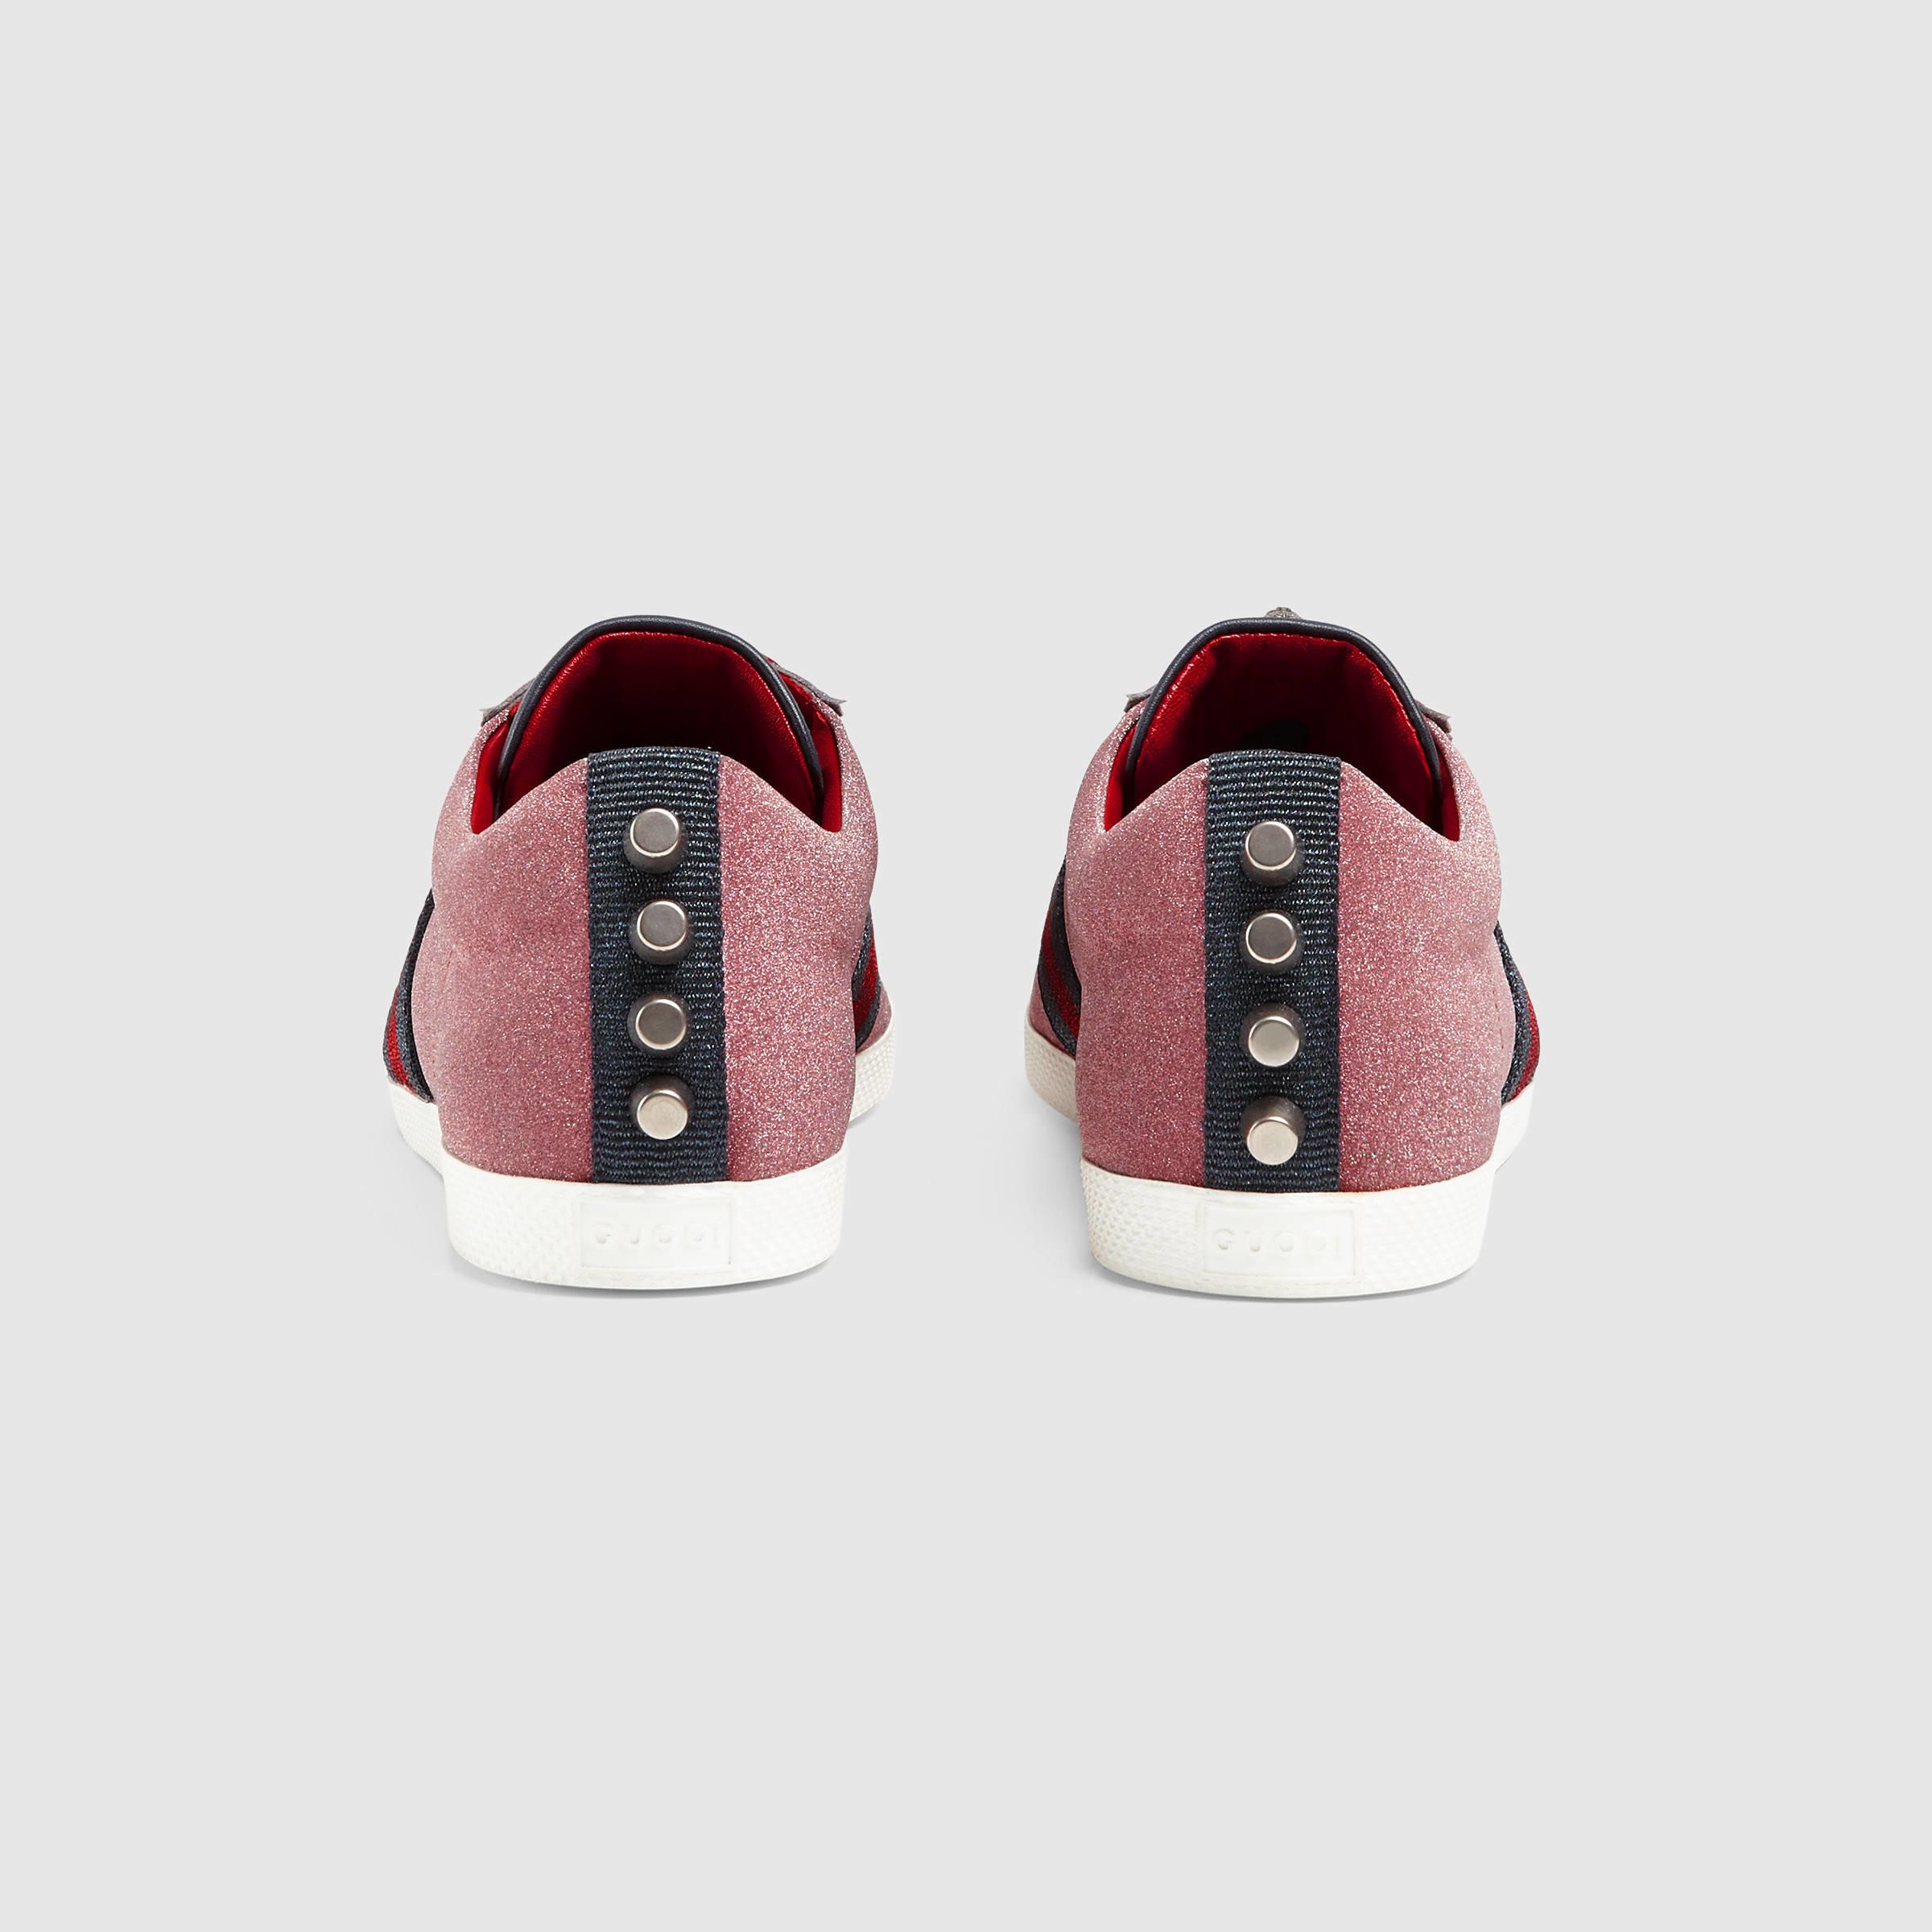 4bfe7c468fd7 Gucci Glitter Web Sneaker in Red - Lyst